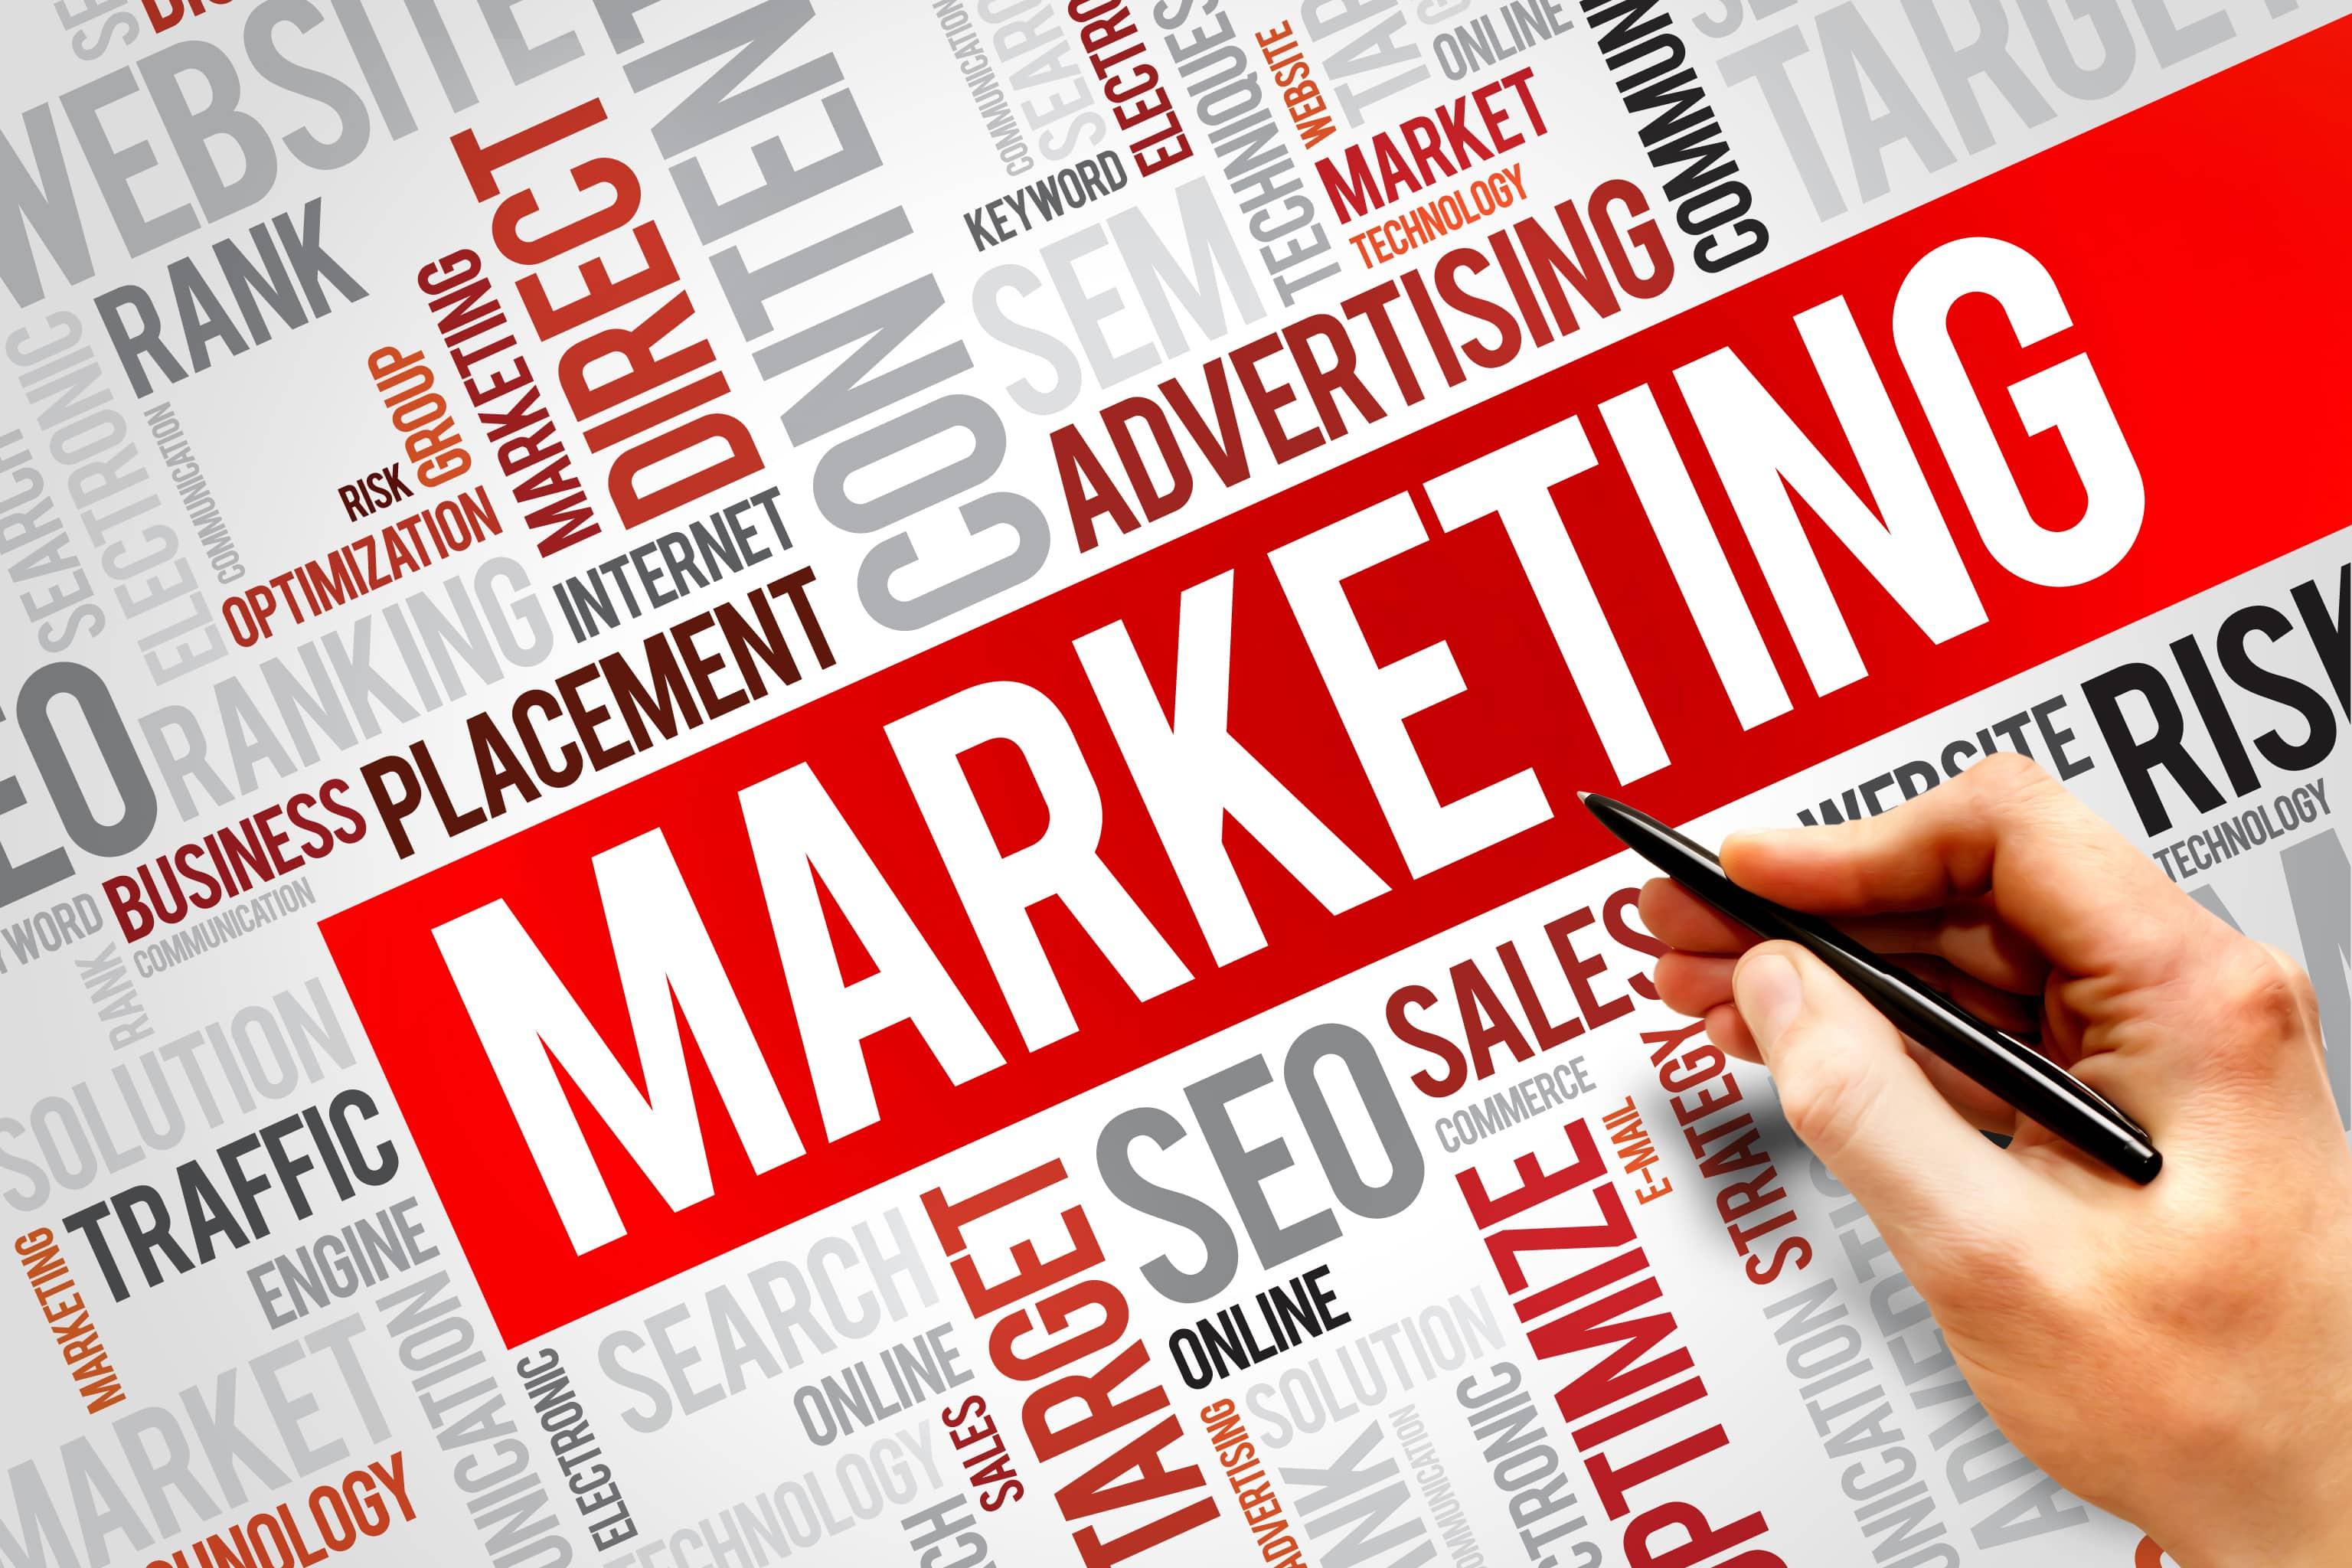 Marketing Companies in Ghana